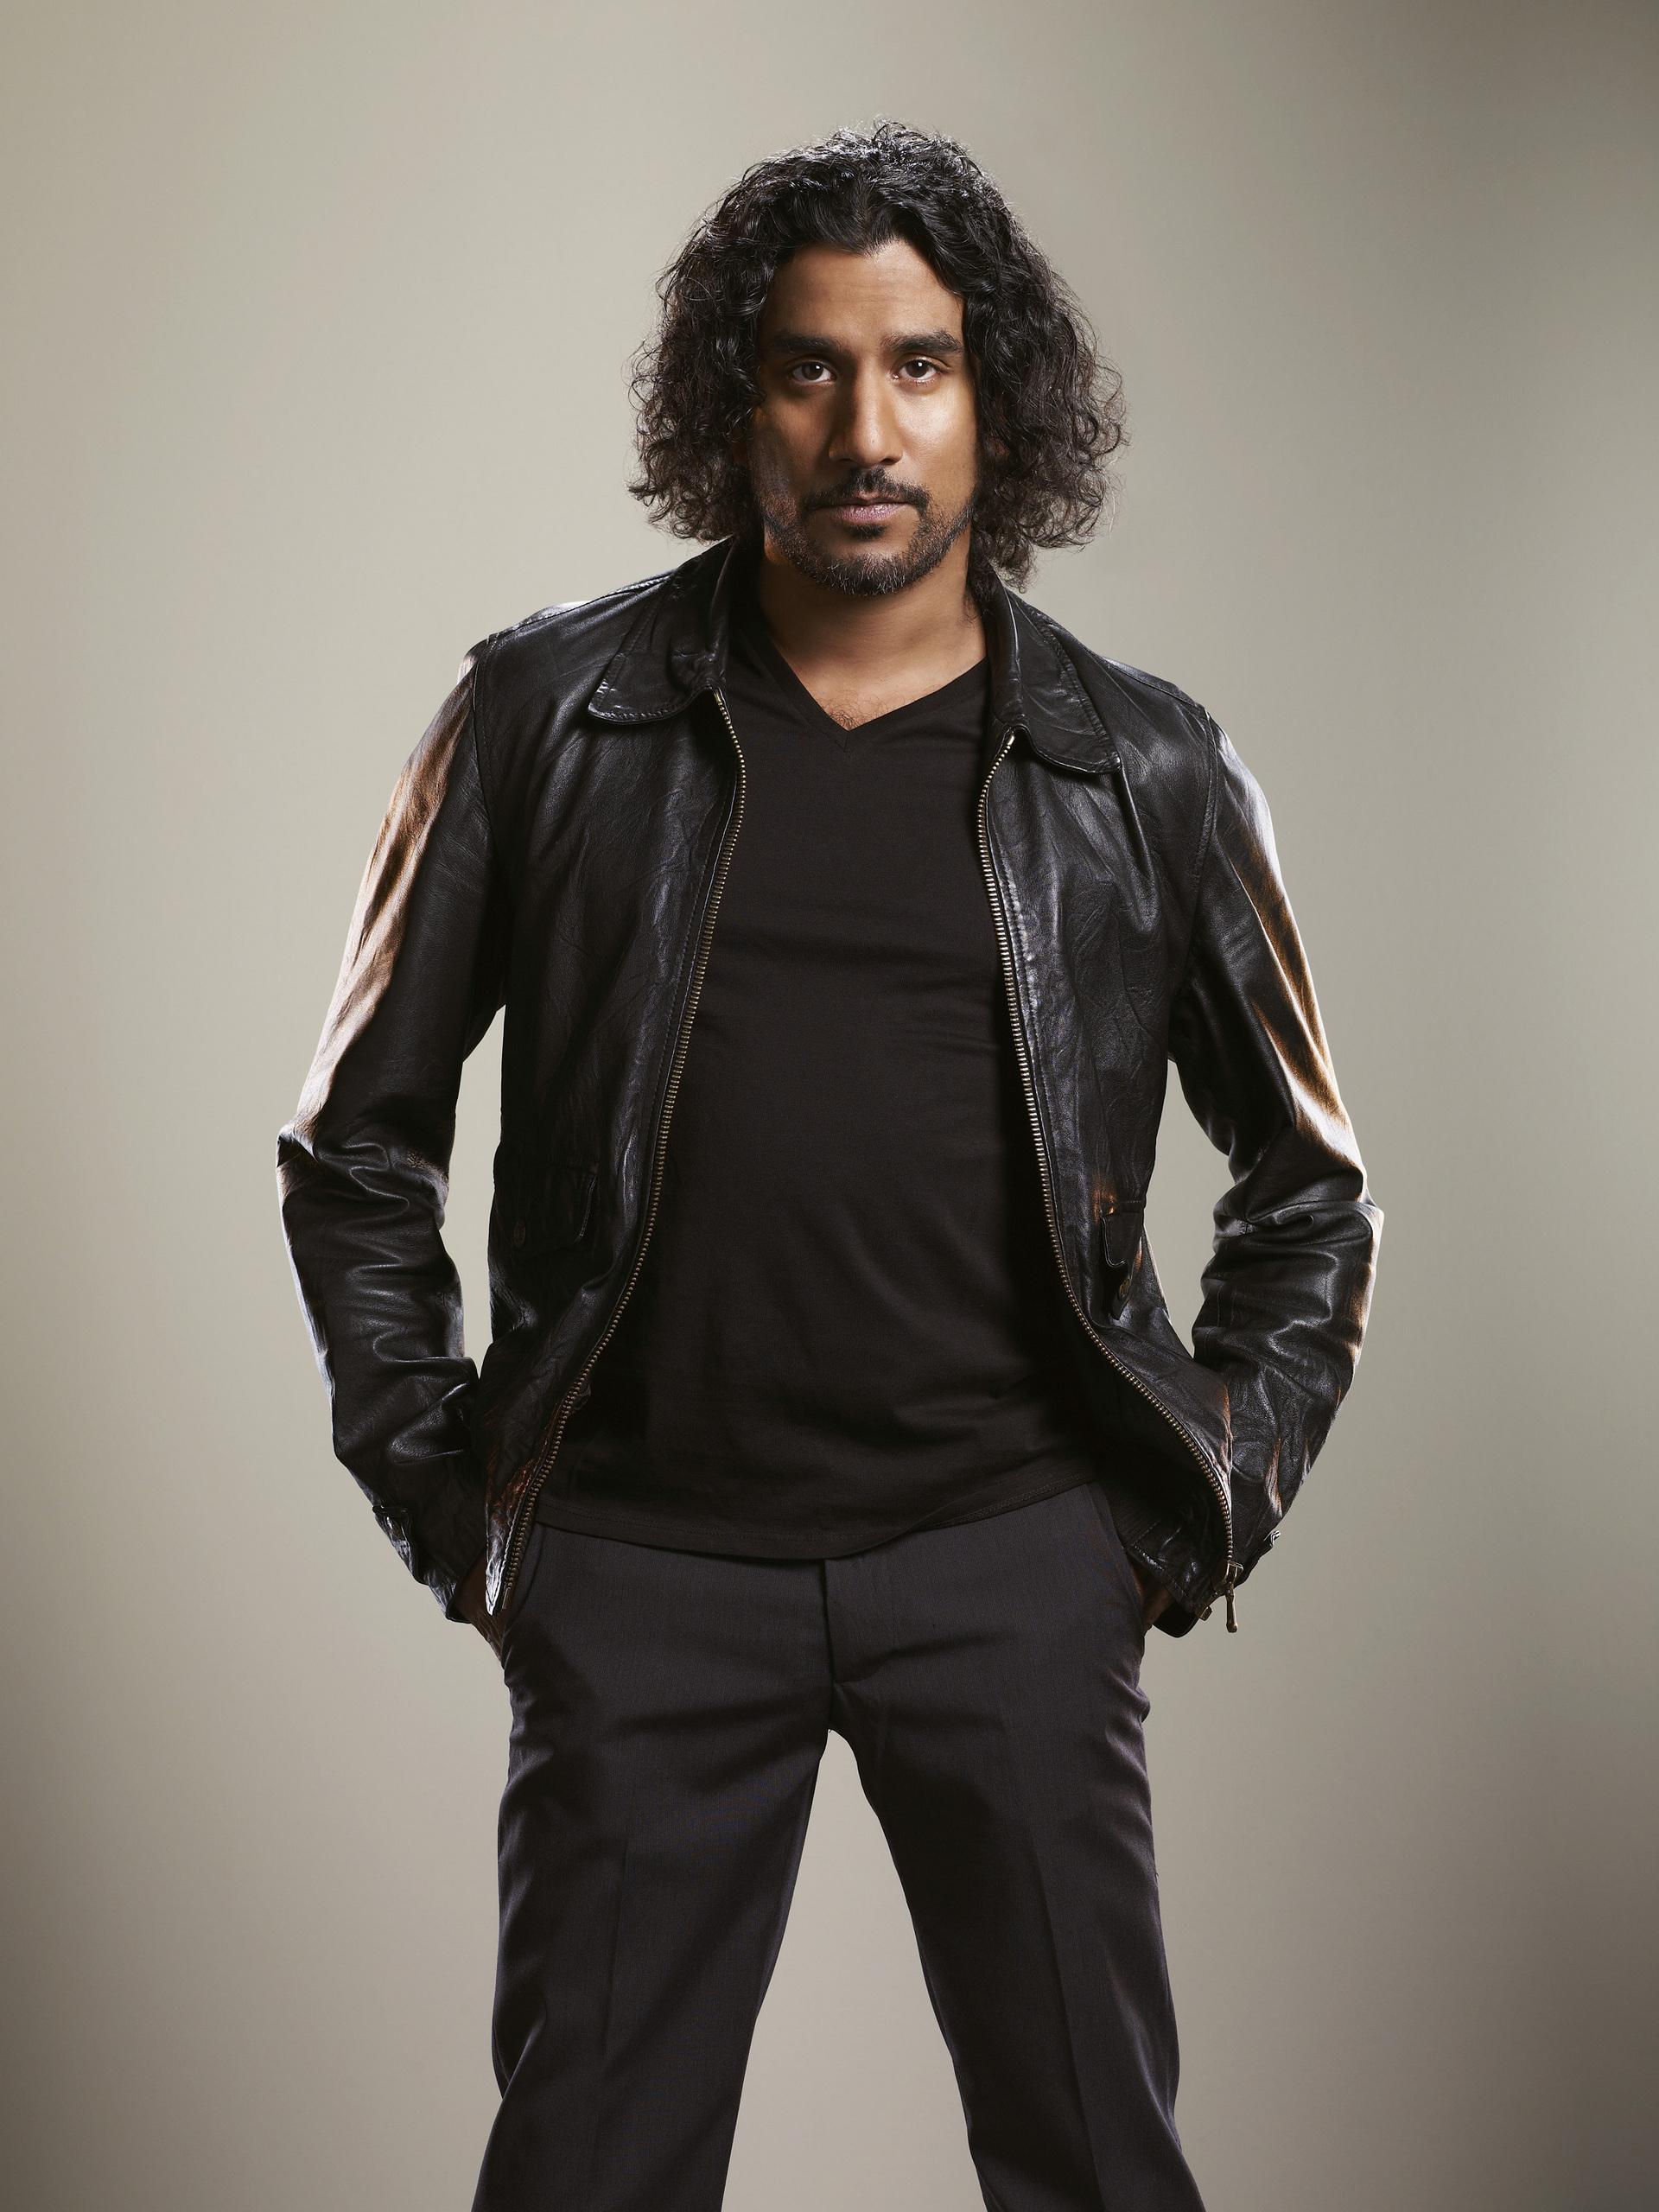 Sayid Hassan Jarrah